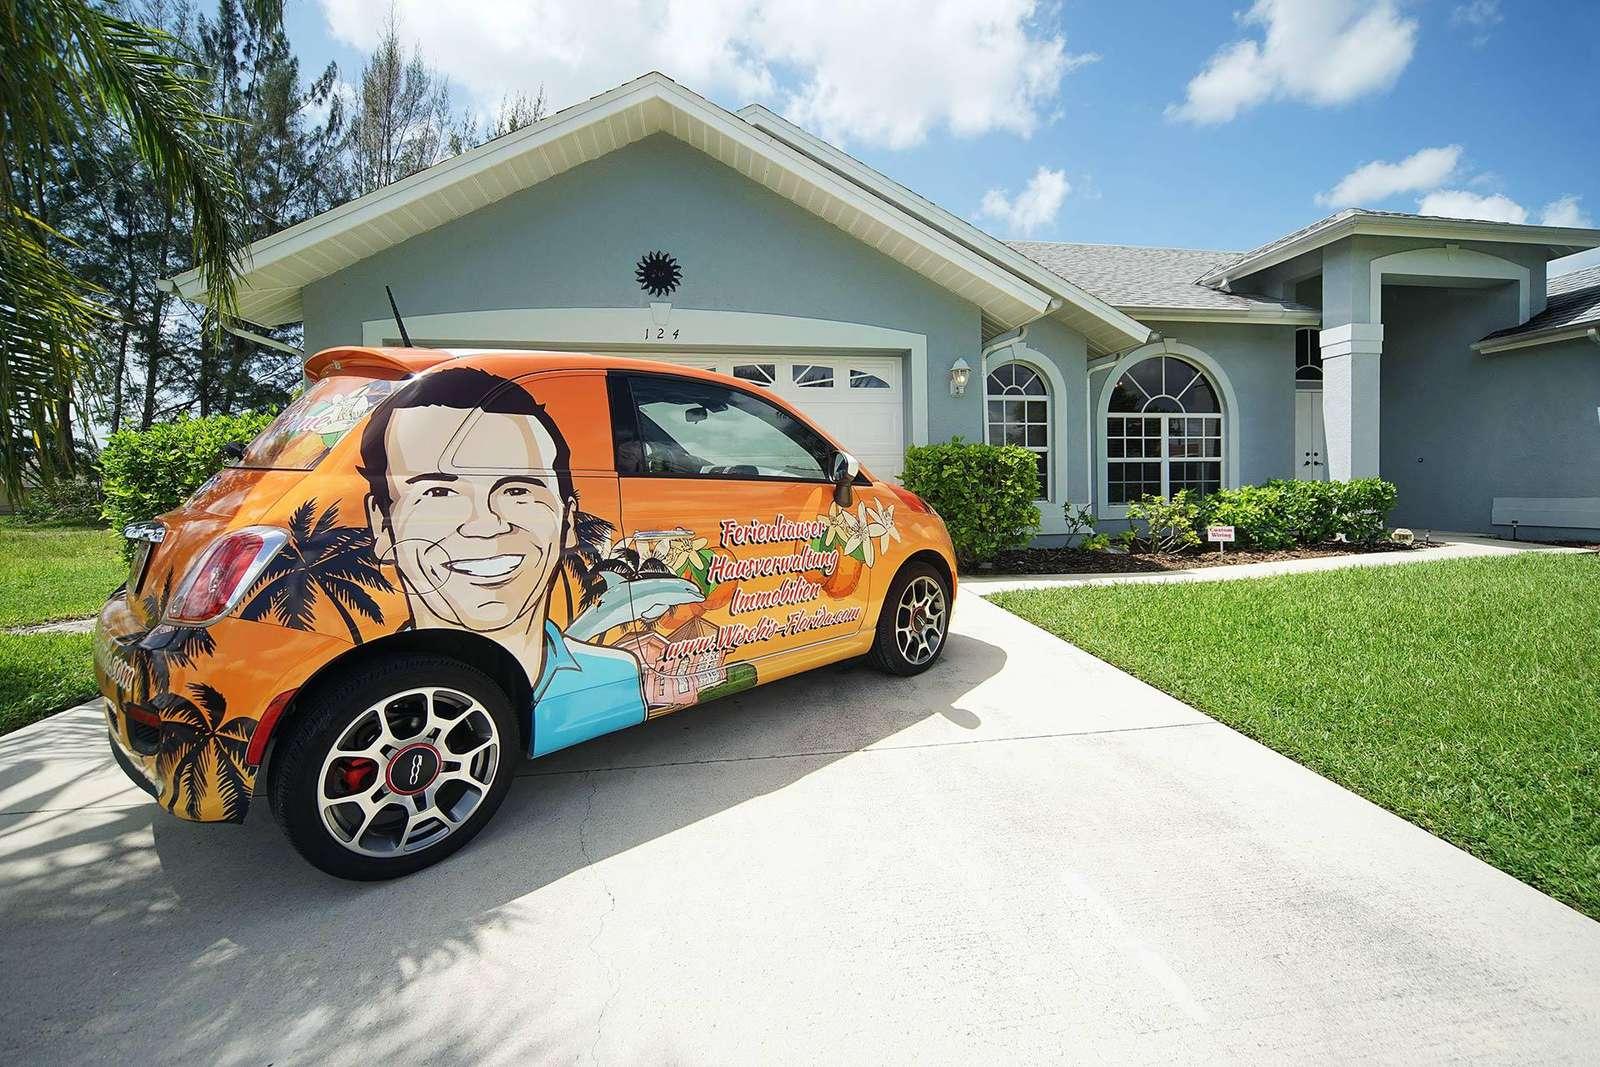 Wischis Florida Home I Vacation Rentals Cape Coral I Property Management I Real Estate